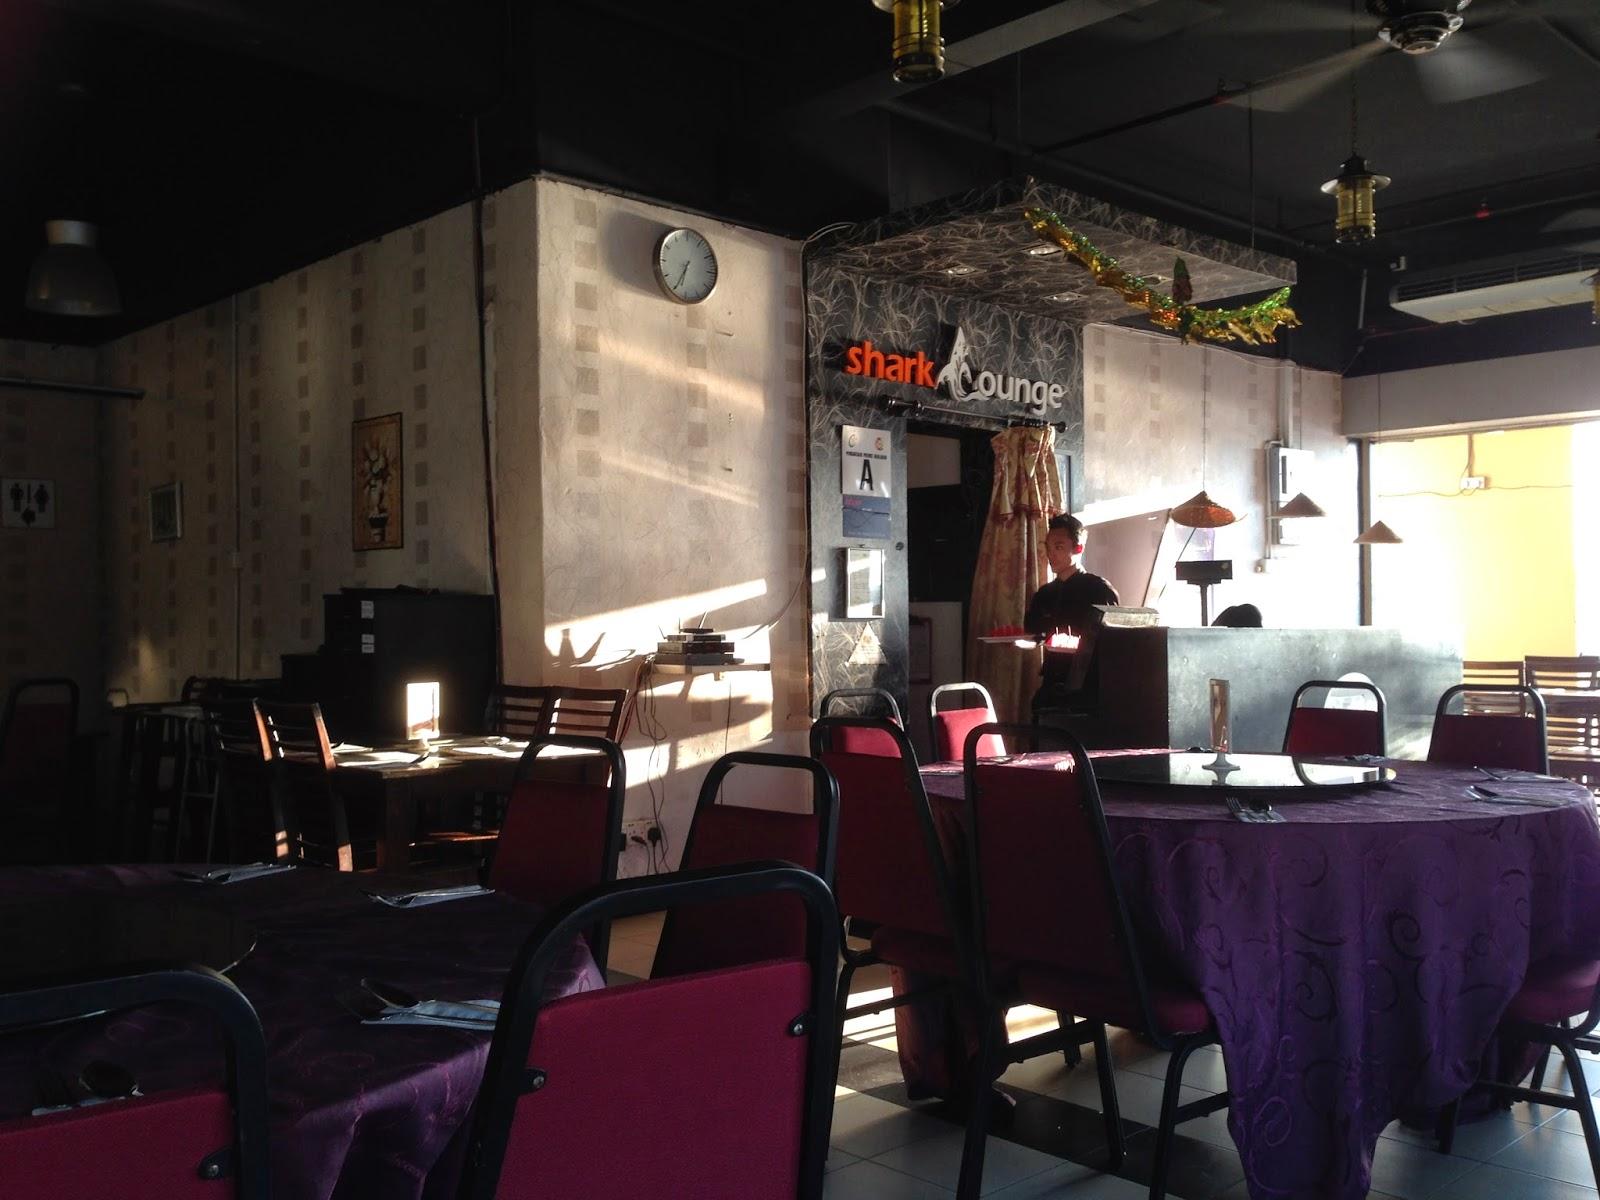 Shark Lounge interior